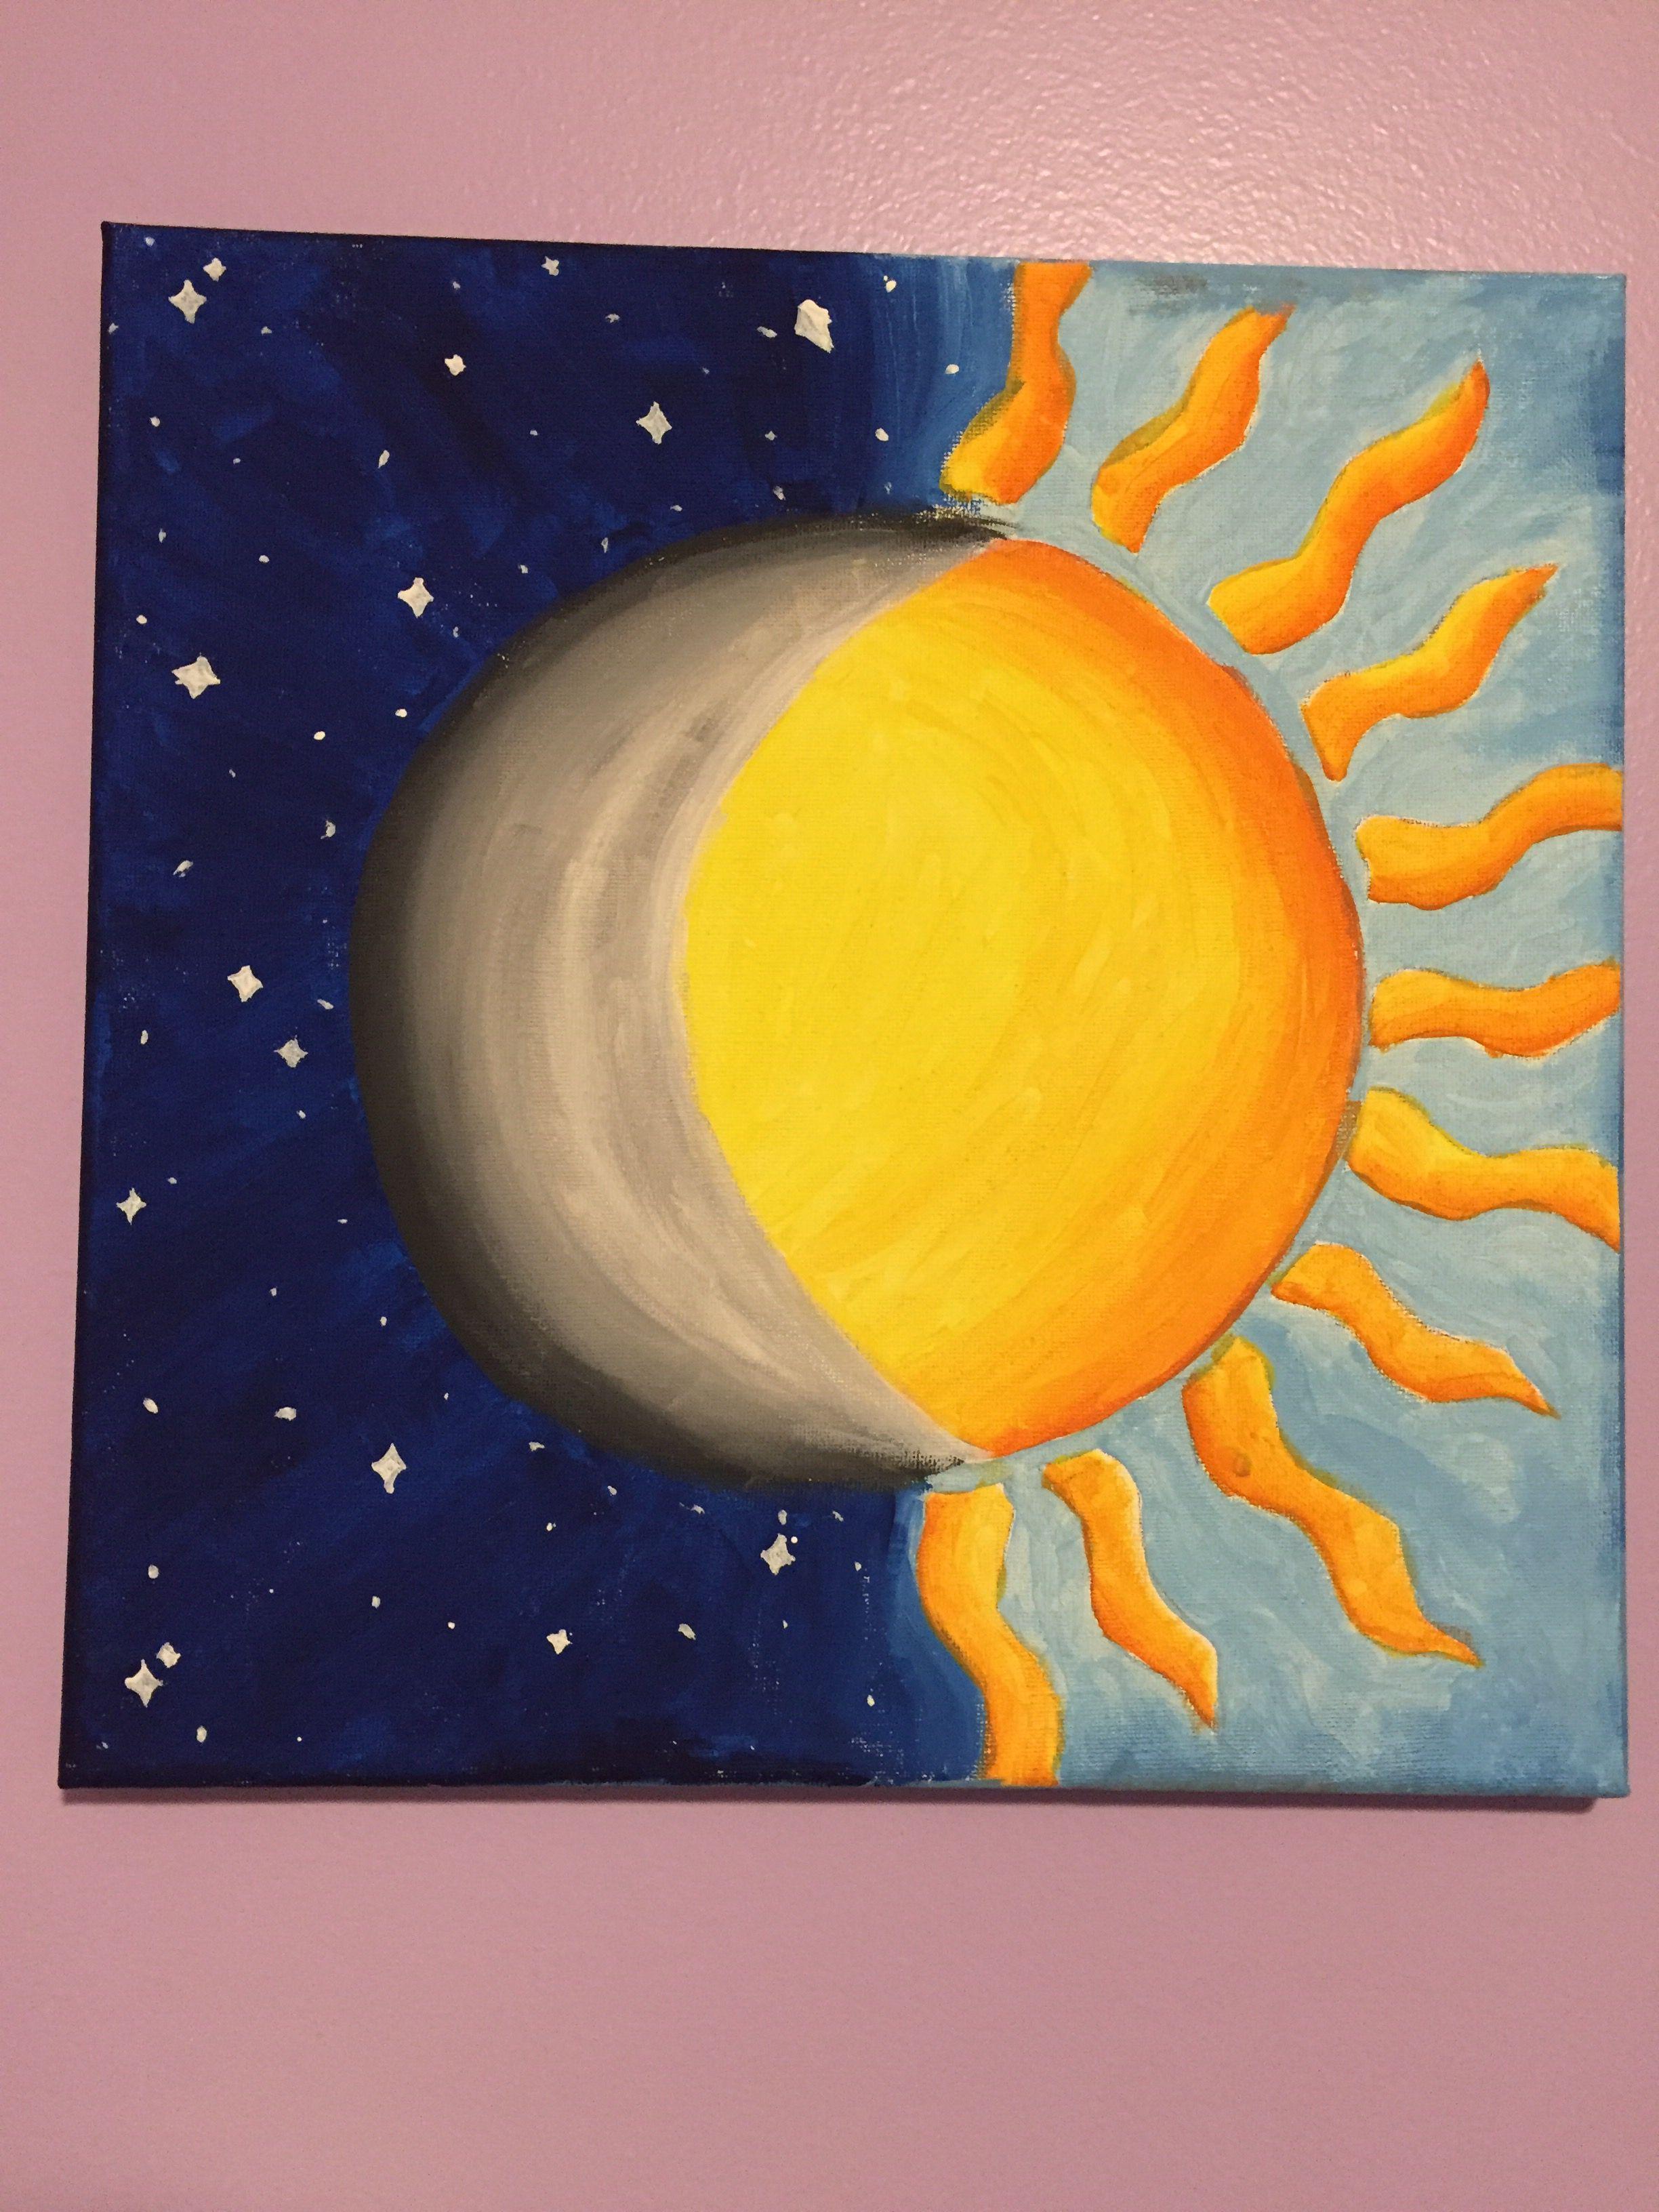 Half Sun Moon Painting Idea My Art Pinterest Paintings And Canvases Canvas Diy Simple Mini